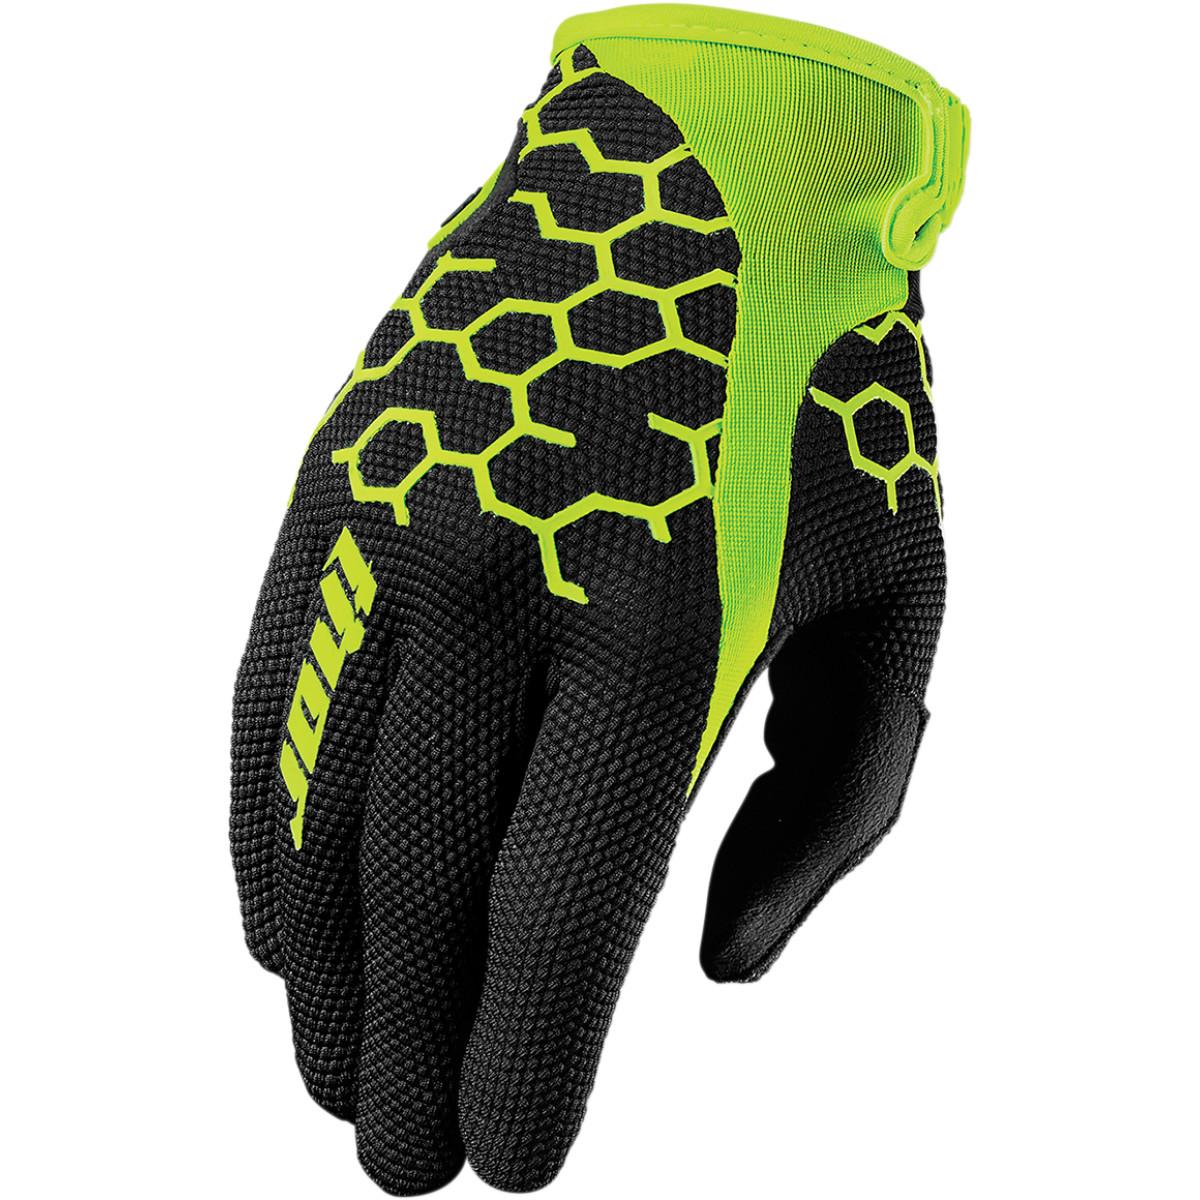 Thor Draft Gloves Short Cuff (Multi Black/Green, X-Small)